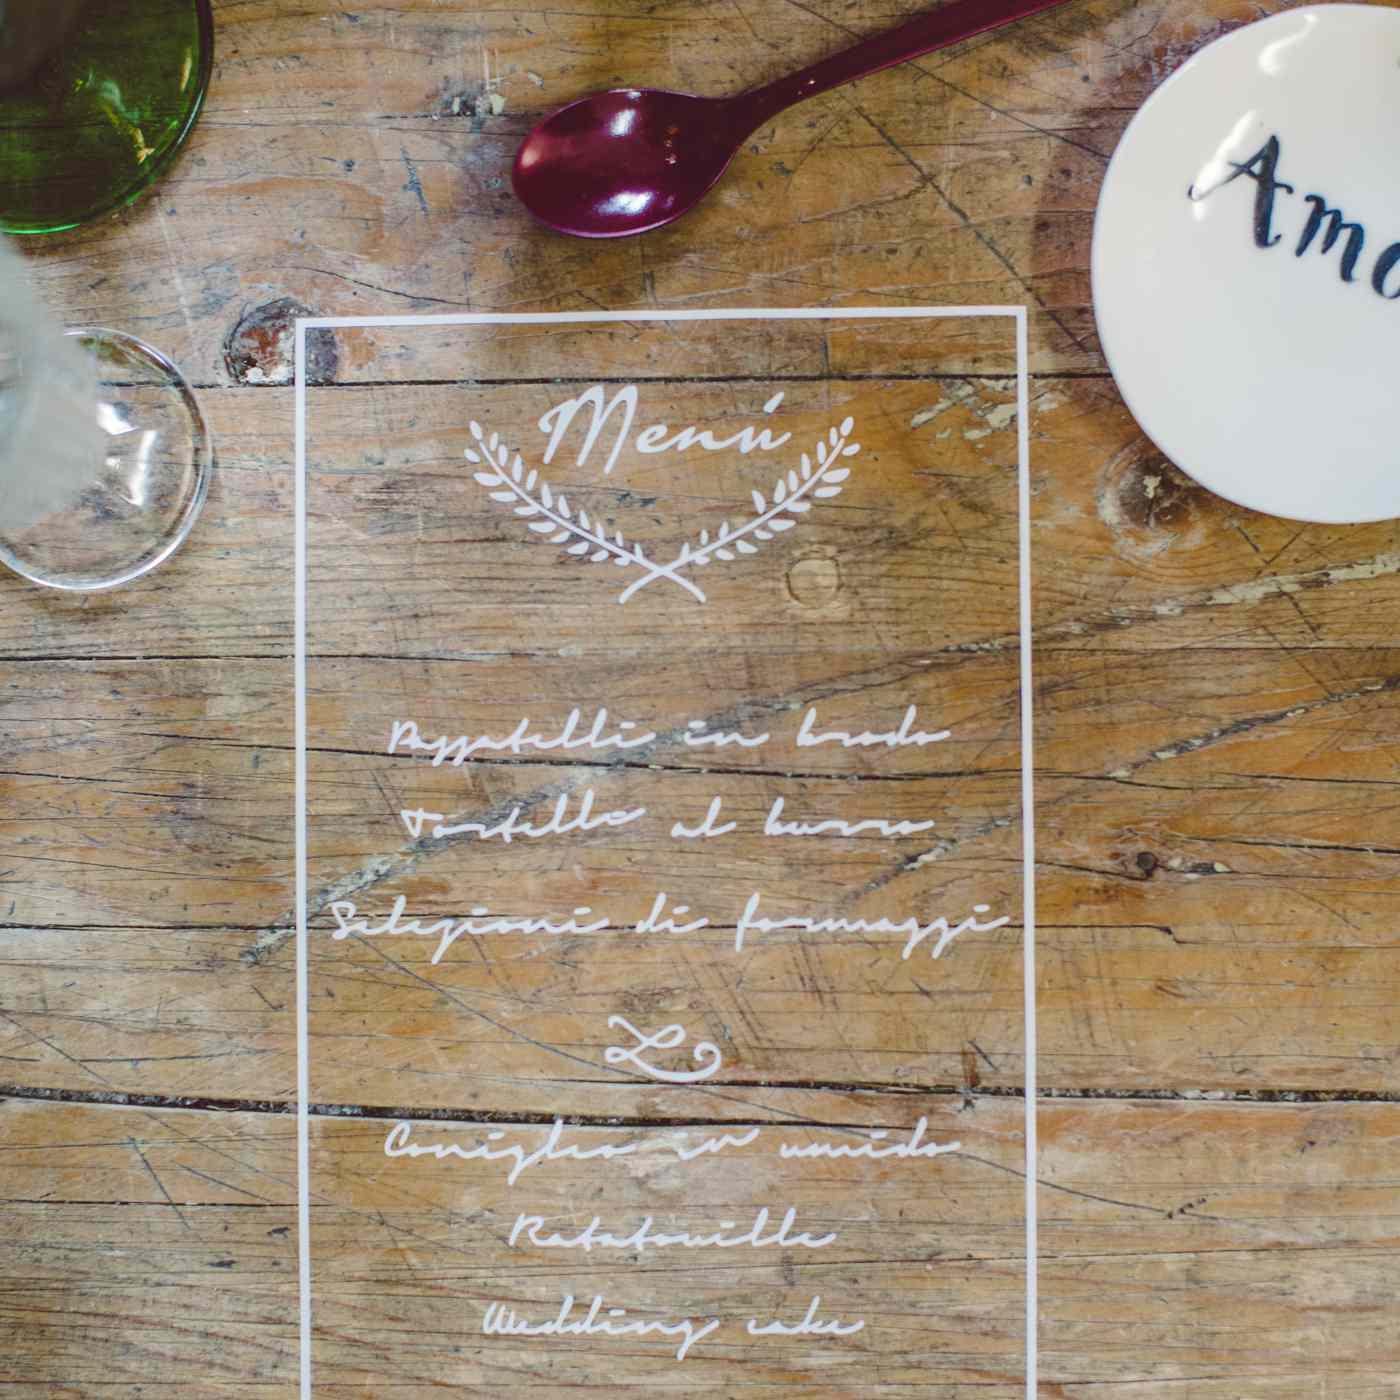 Wedding Menu Written on Wooden Table